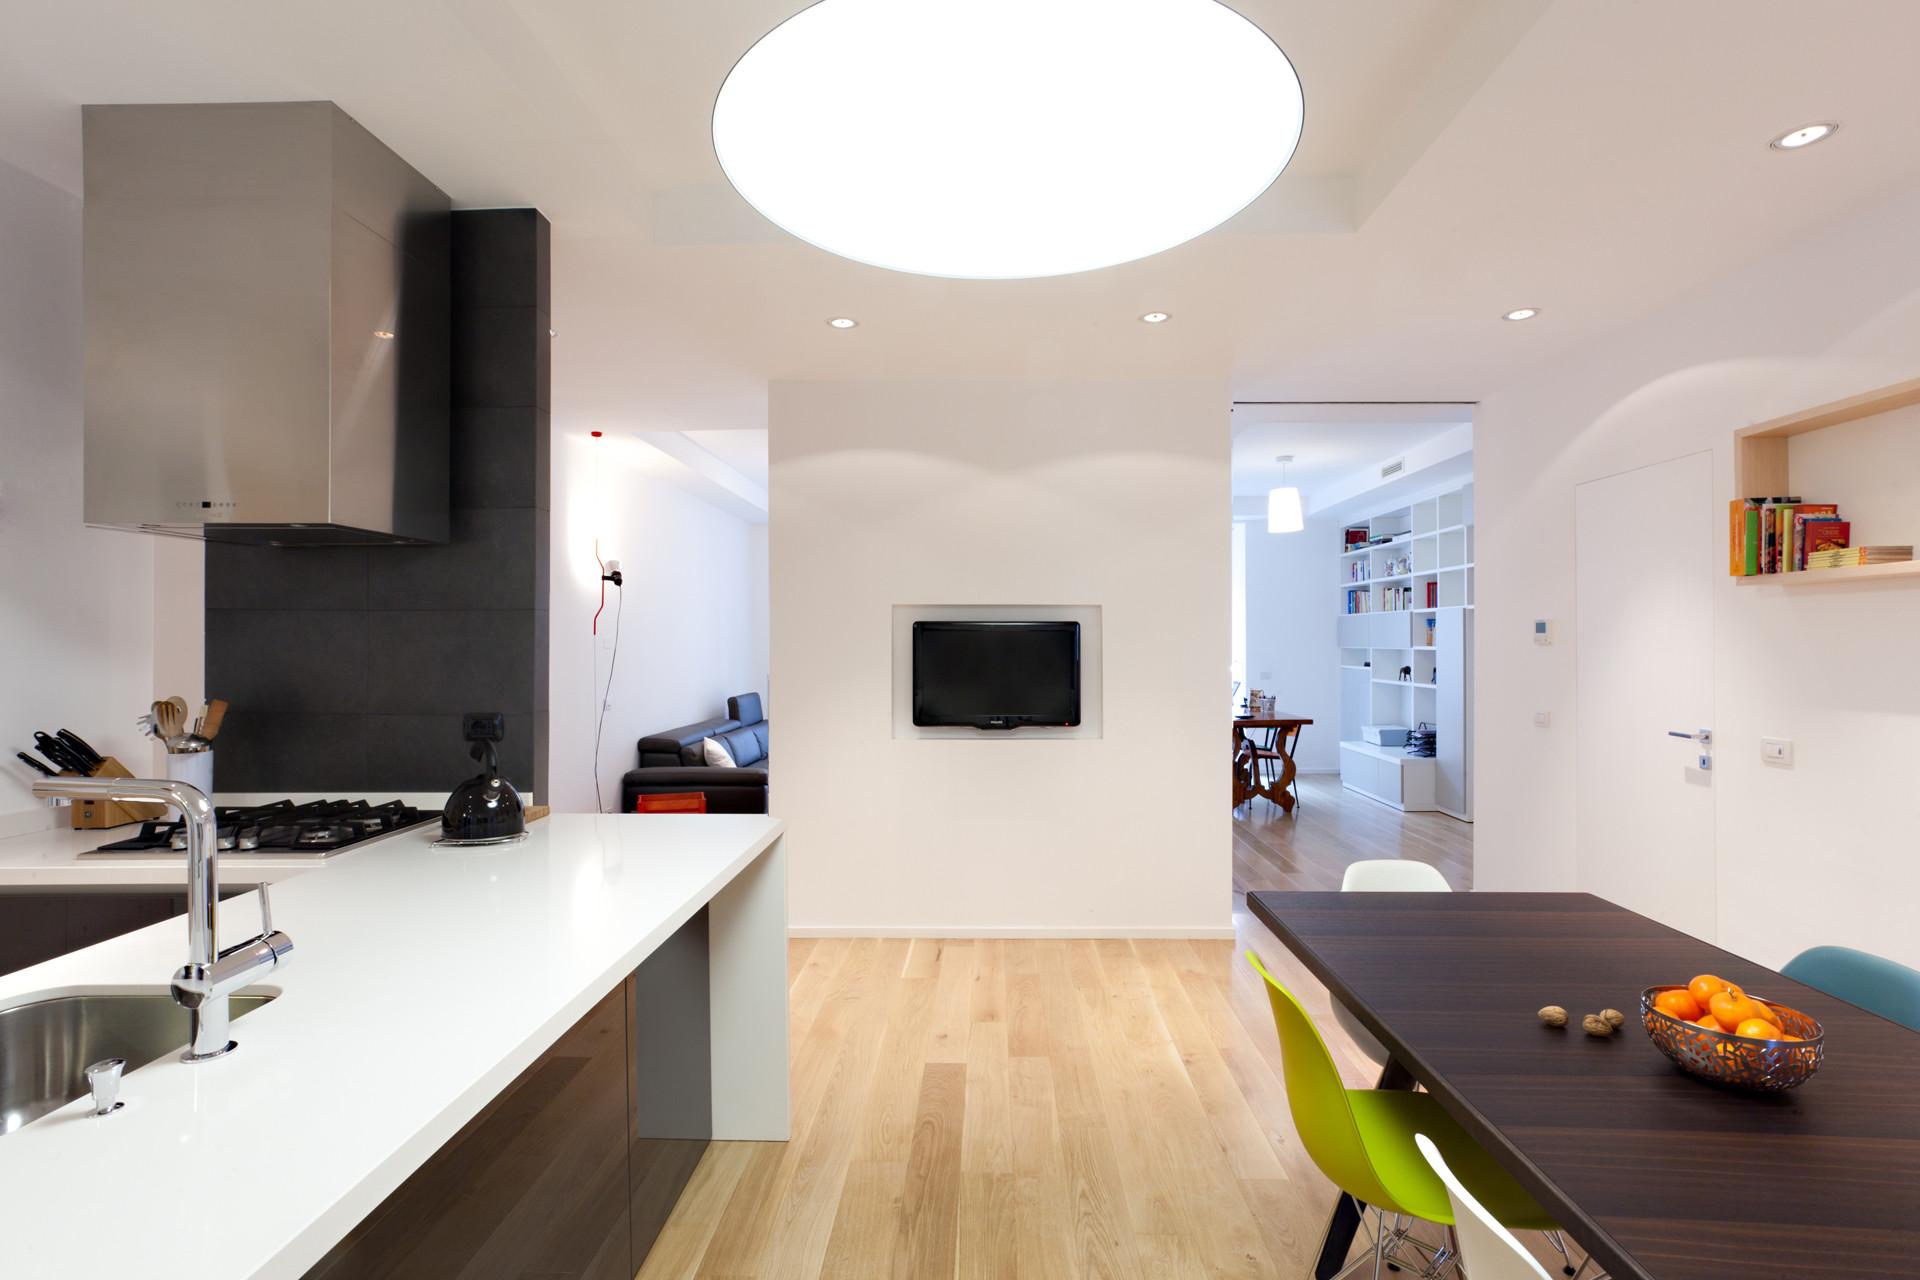 Wisp-Architects- Oxilia Apartment 3